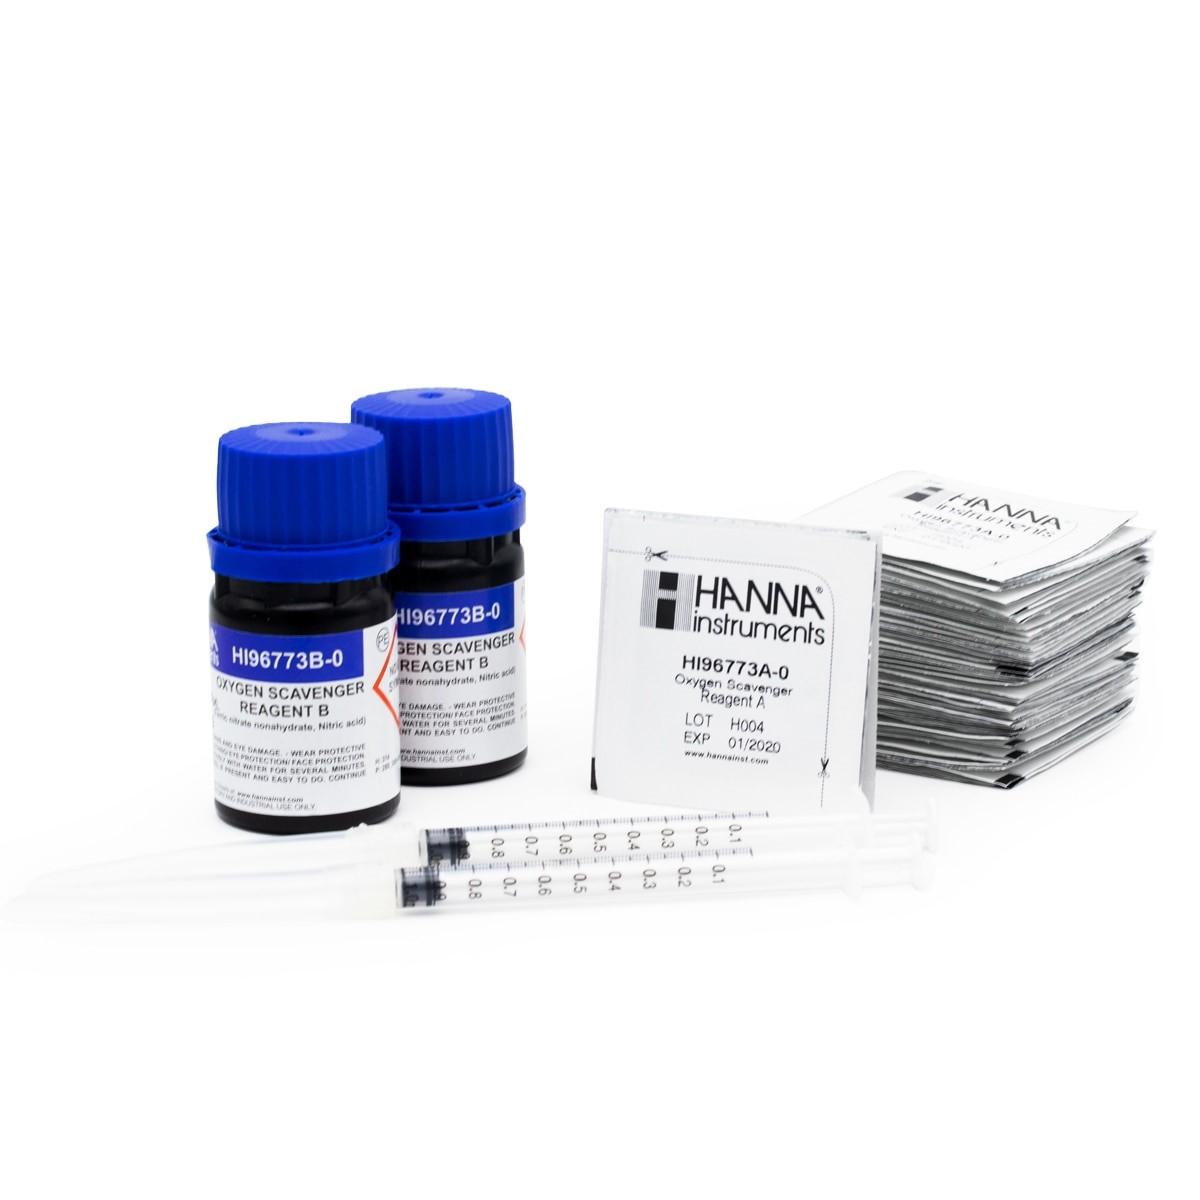 Oxygen Scavengers Reagents (50 tests) – HI96773-01